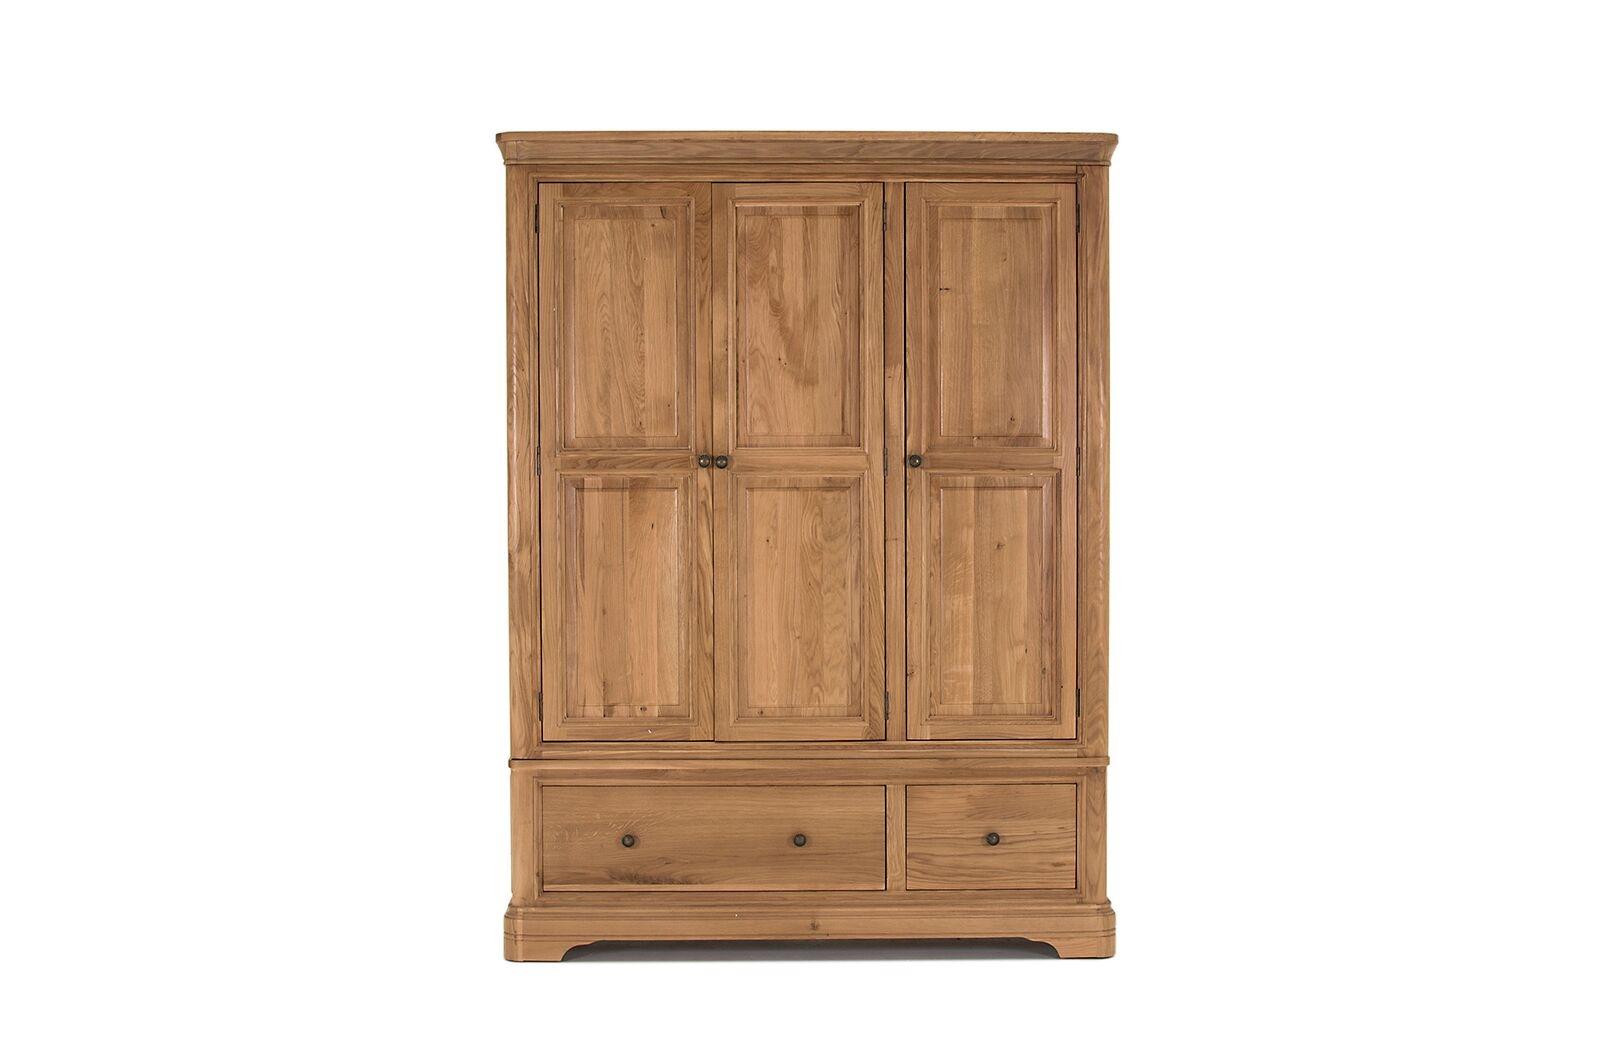 Dulap din lemn de stejar si furnir cu 3 usi si 2 sertare Carmen Oak l1447xA575xH192 cm